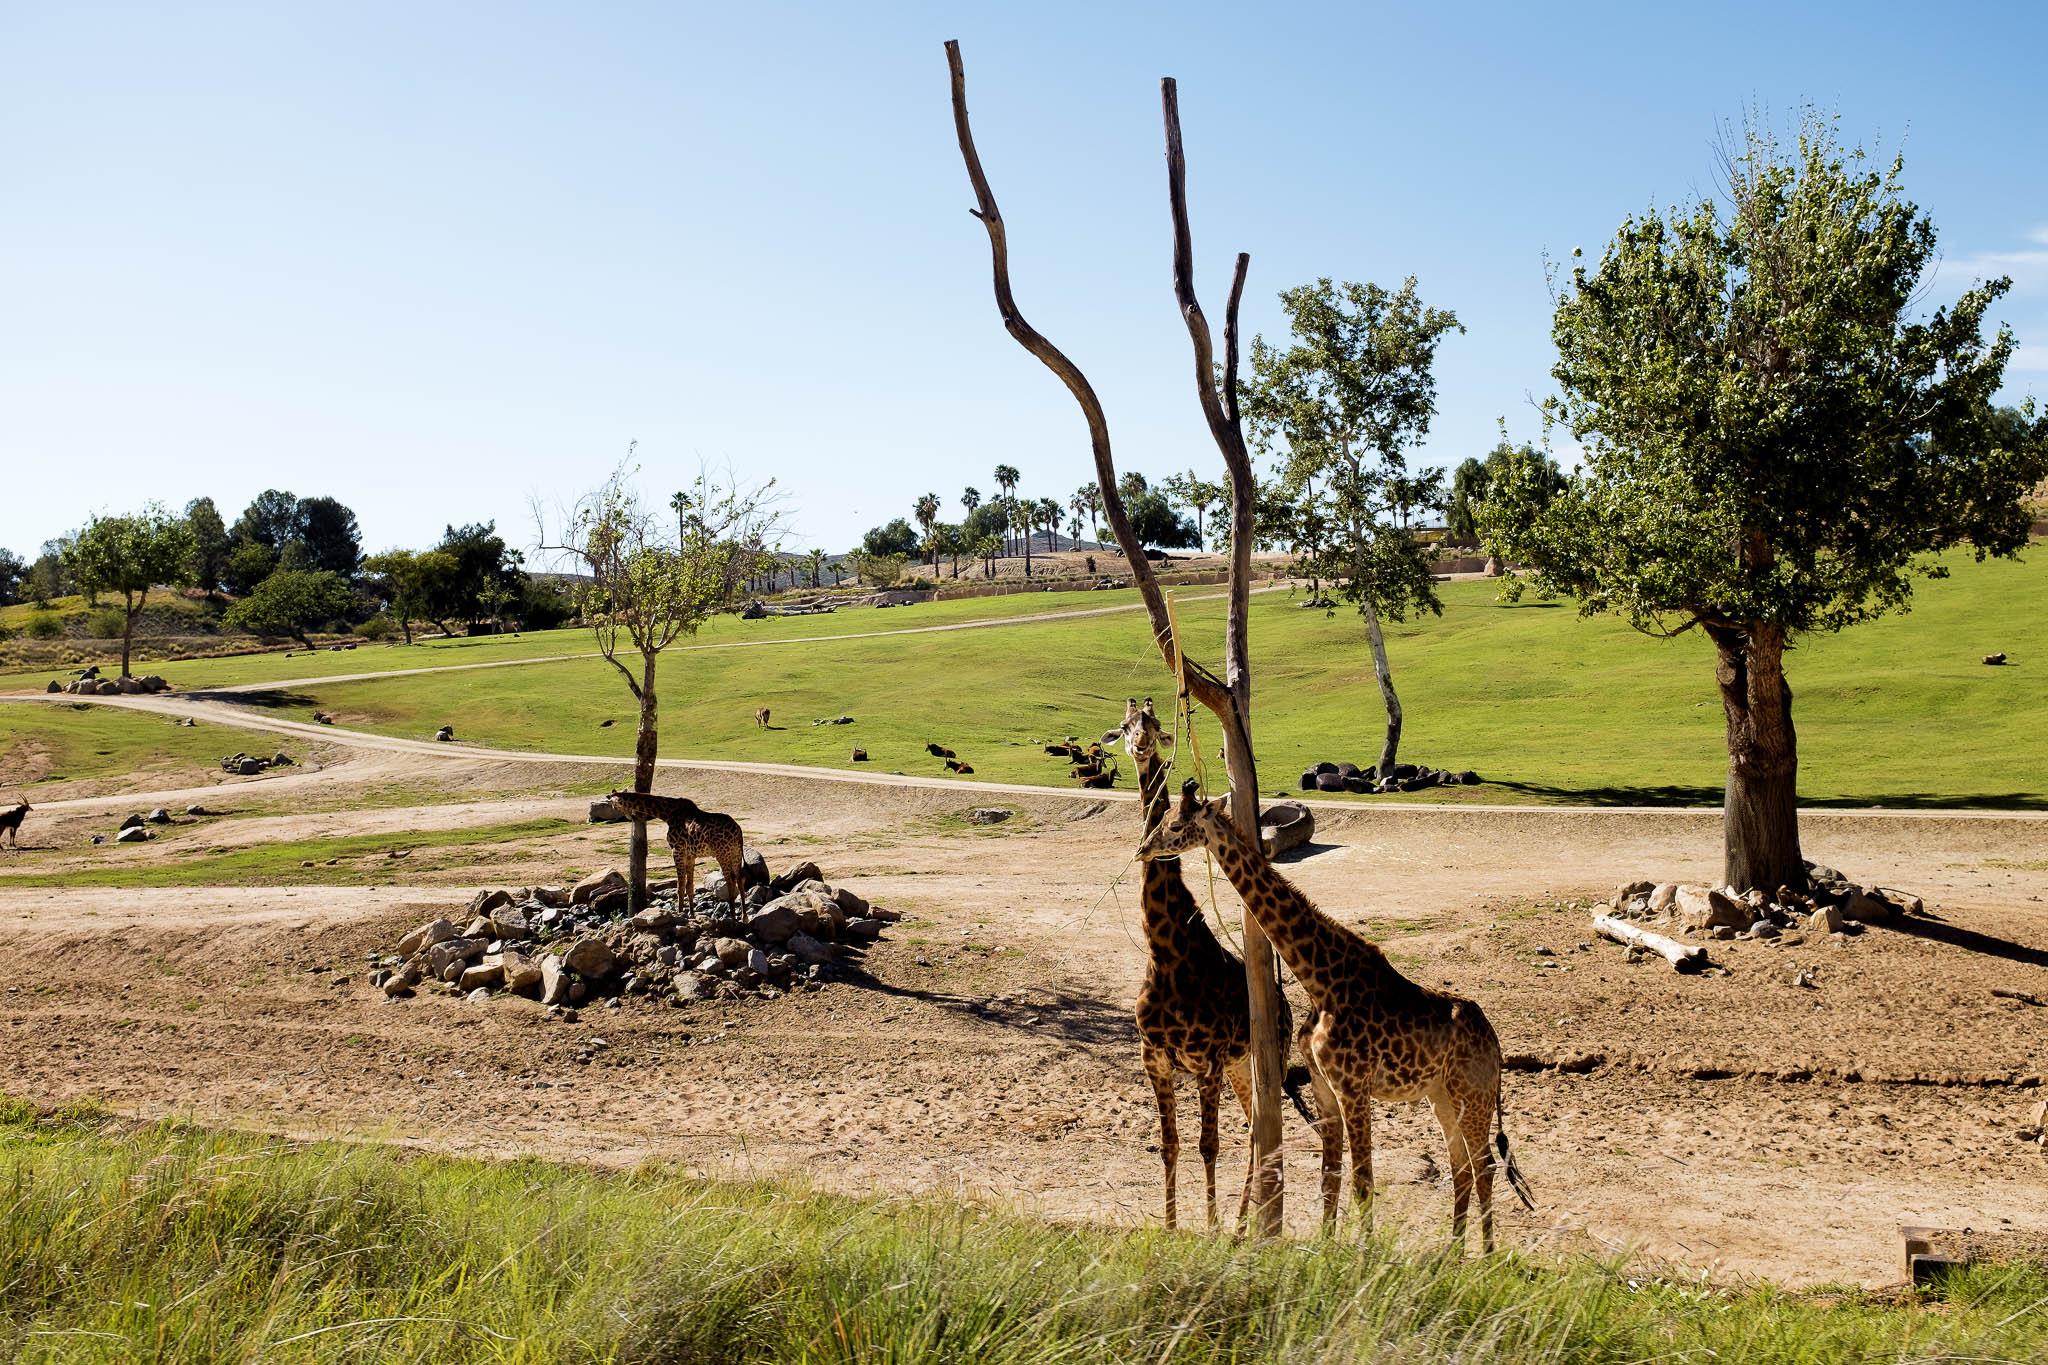 San Diego Safari Park-2016--13.jpg